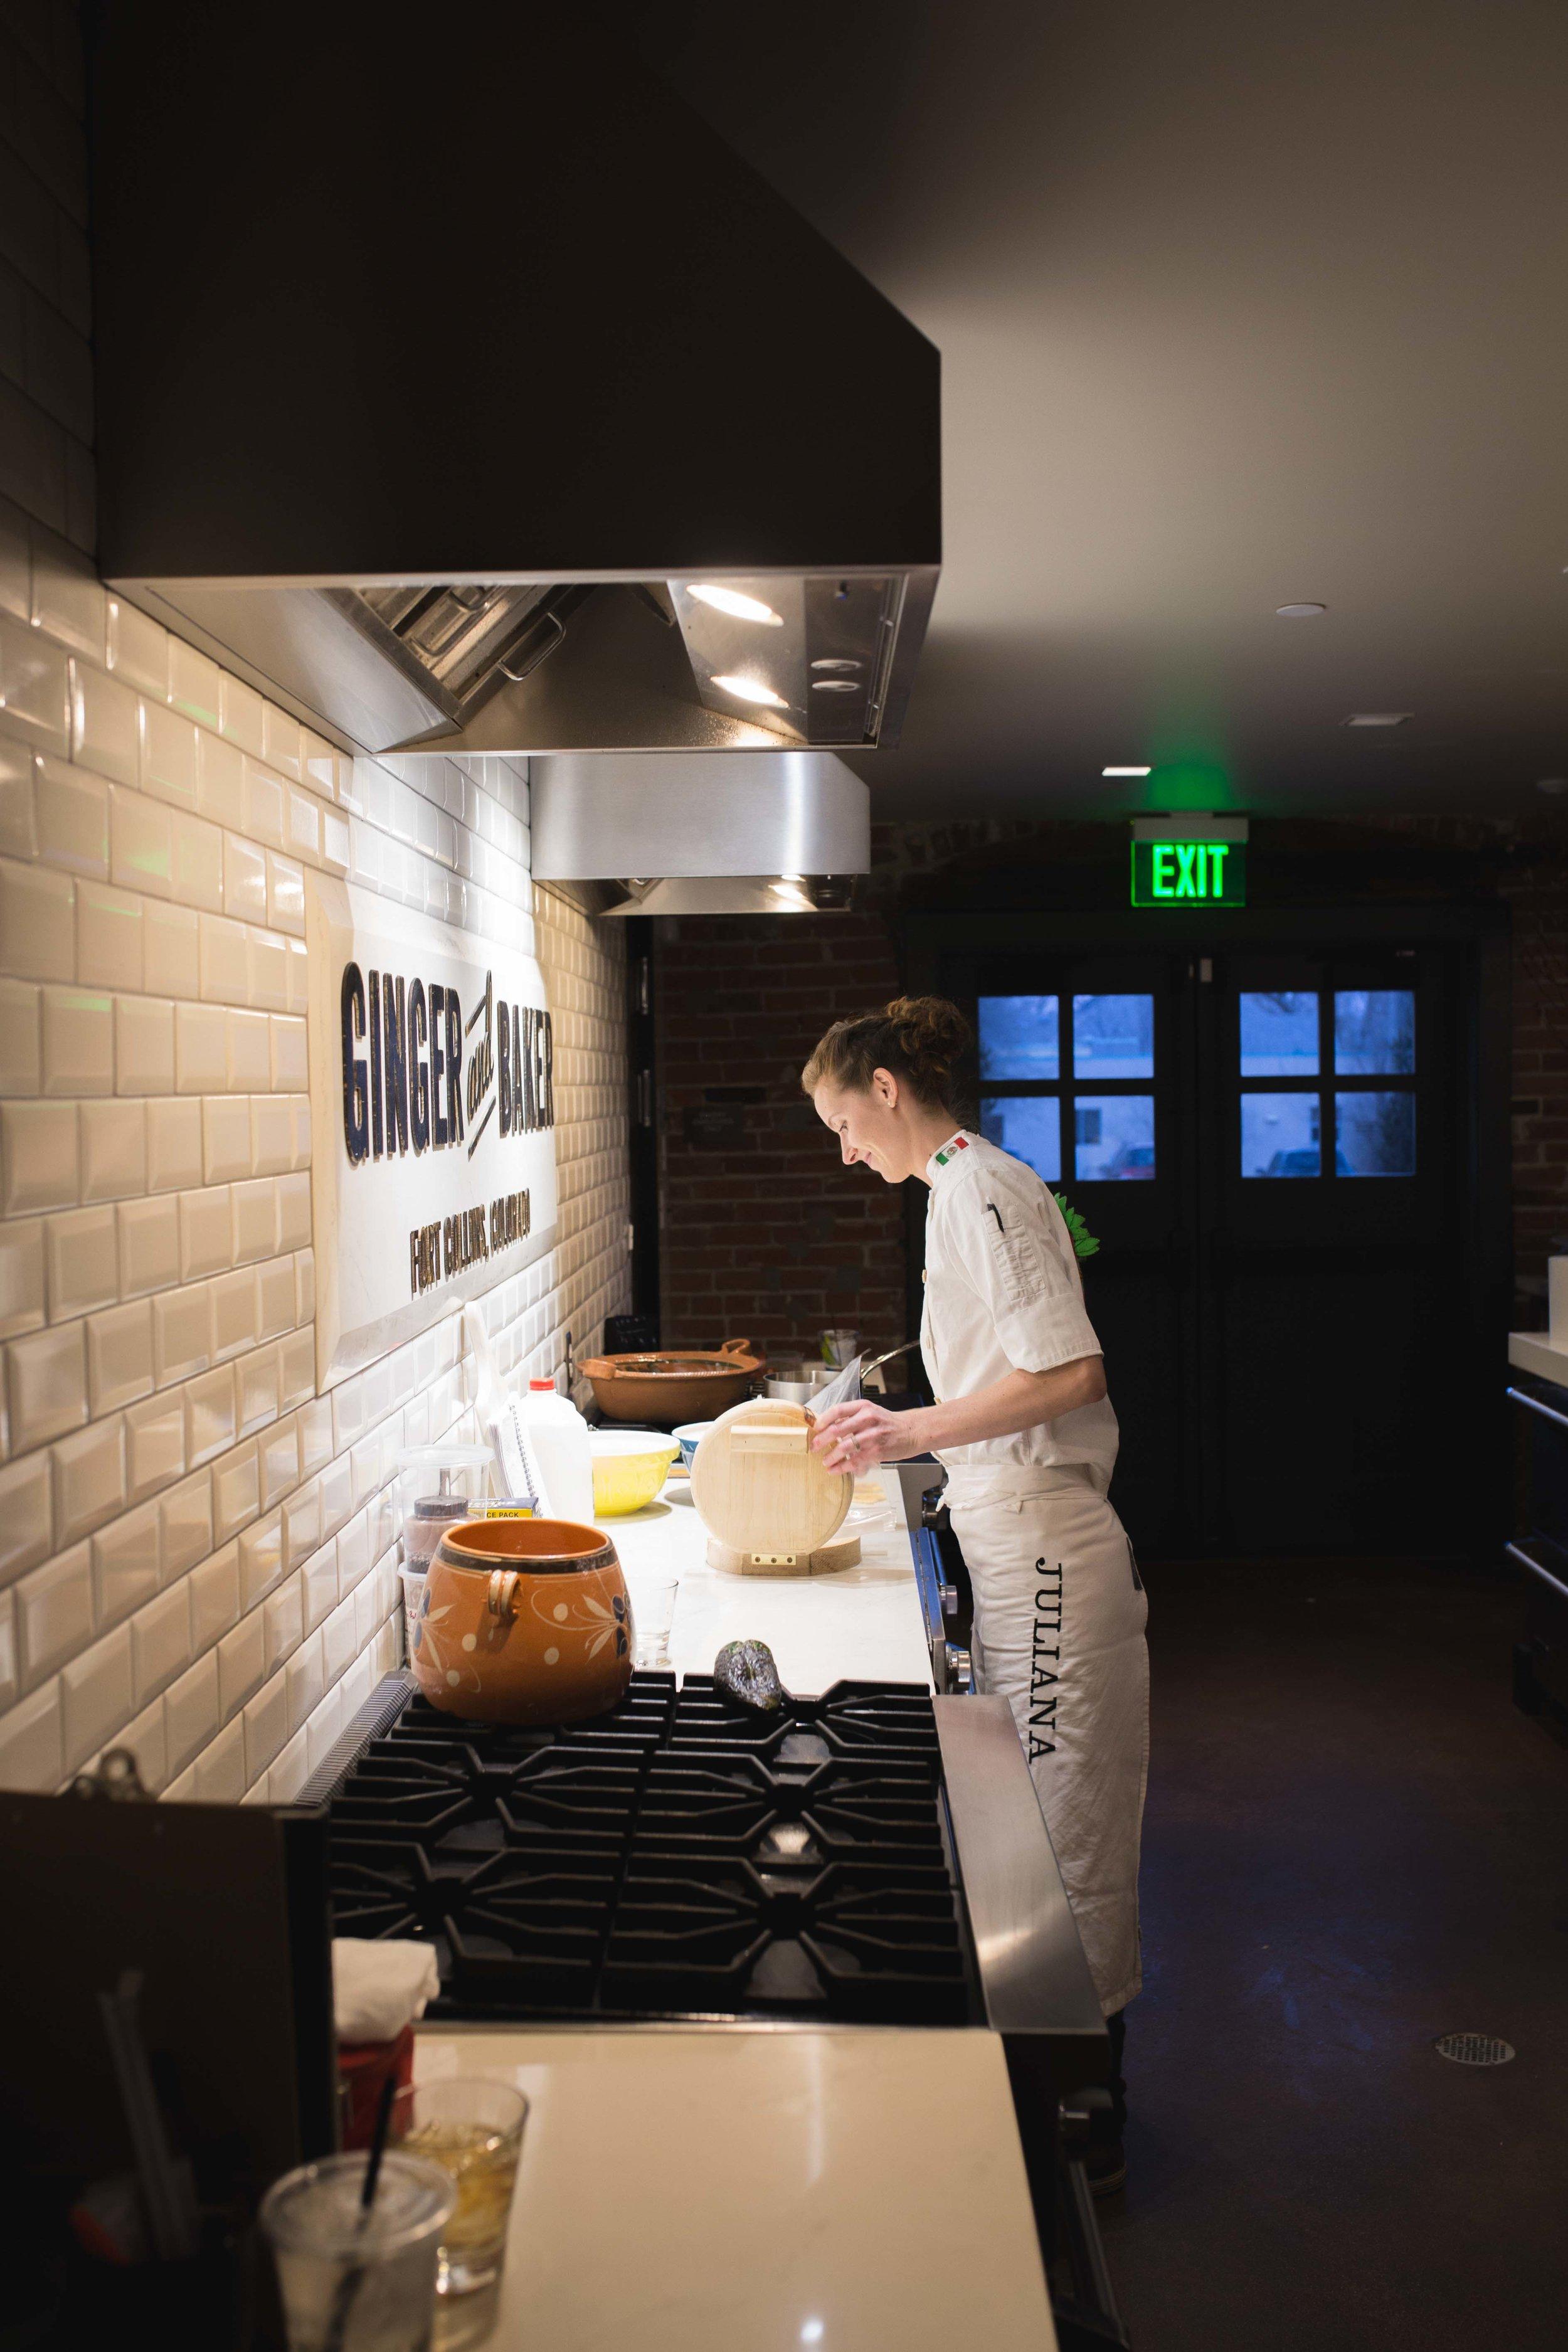 GingerandBaker-JuliyJuan-CookingClass-Feb28-9.jpg